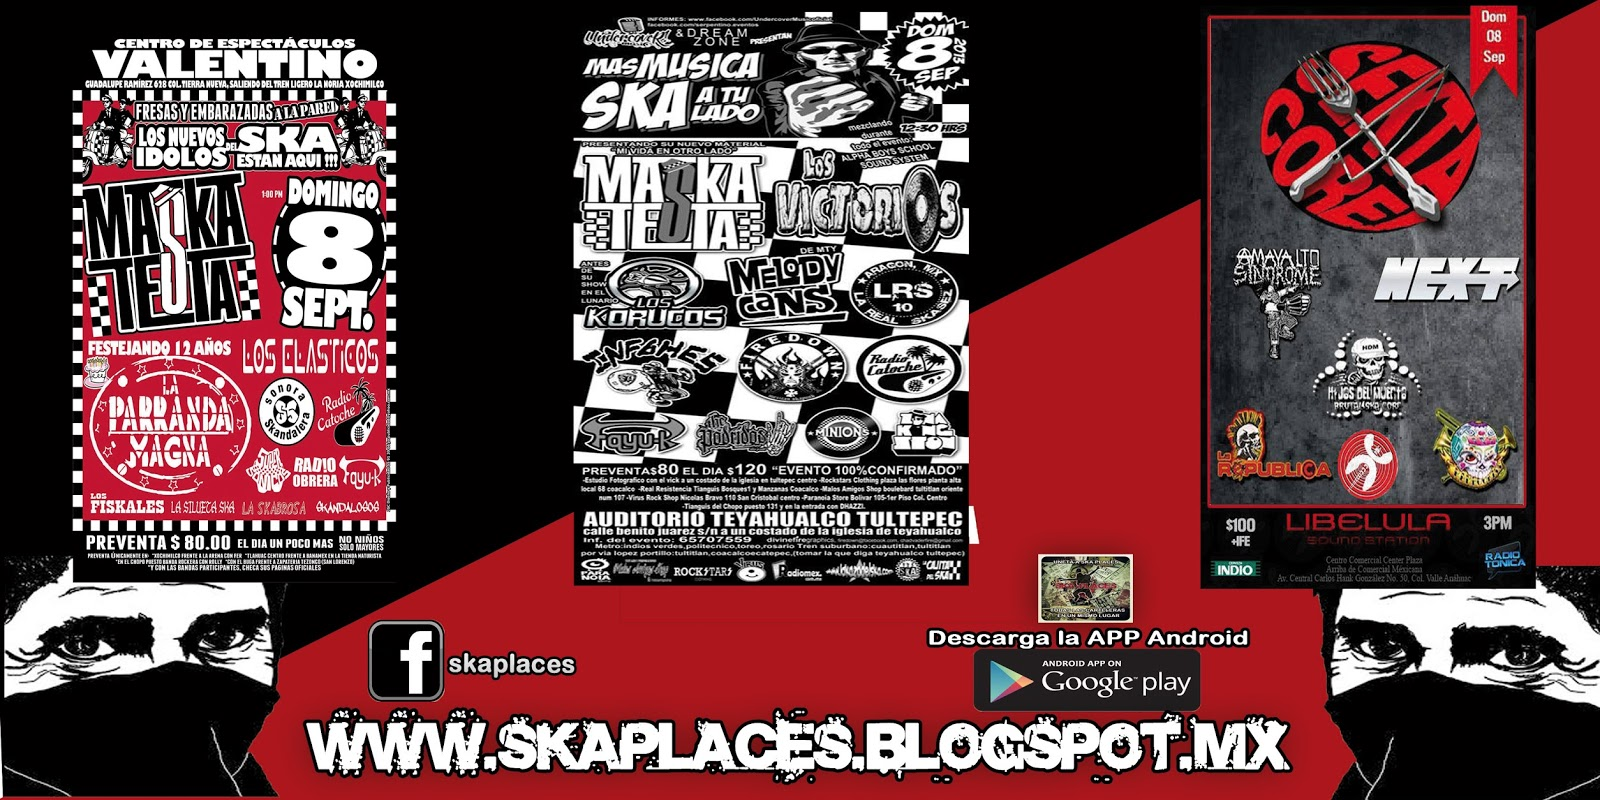 Cartelera Final de Ska Places Sabado•••Domingo de Ska,Punk